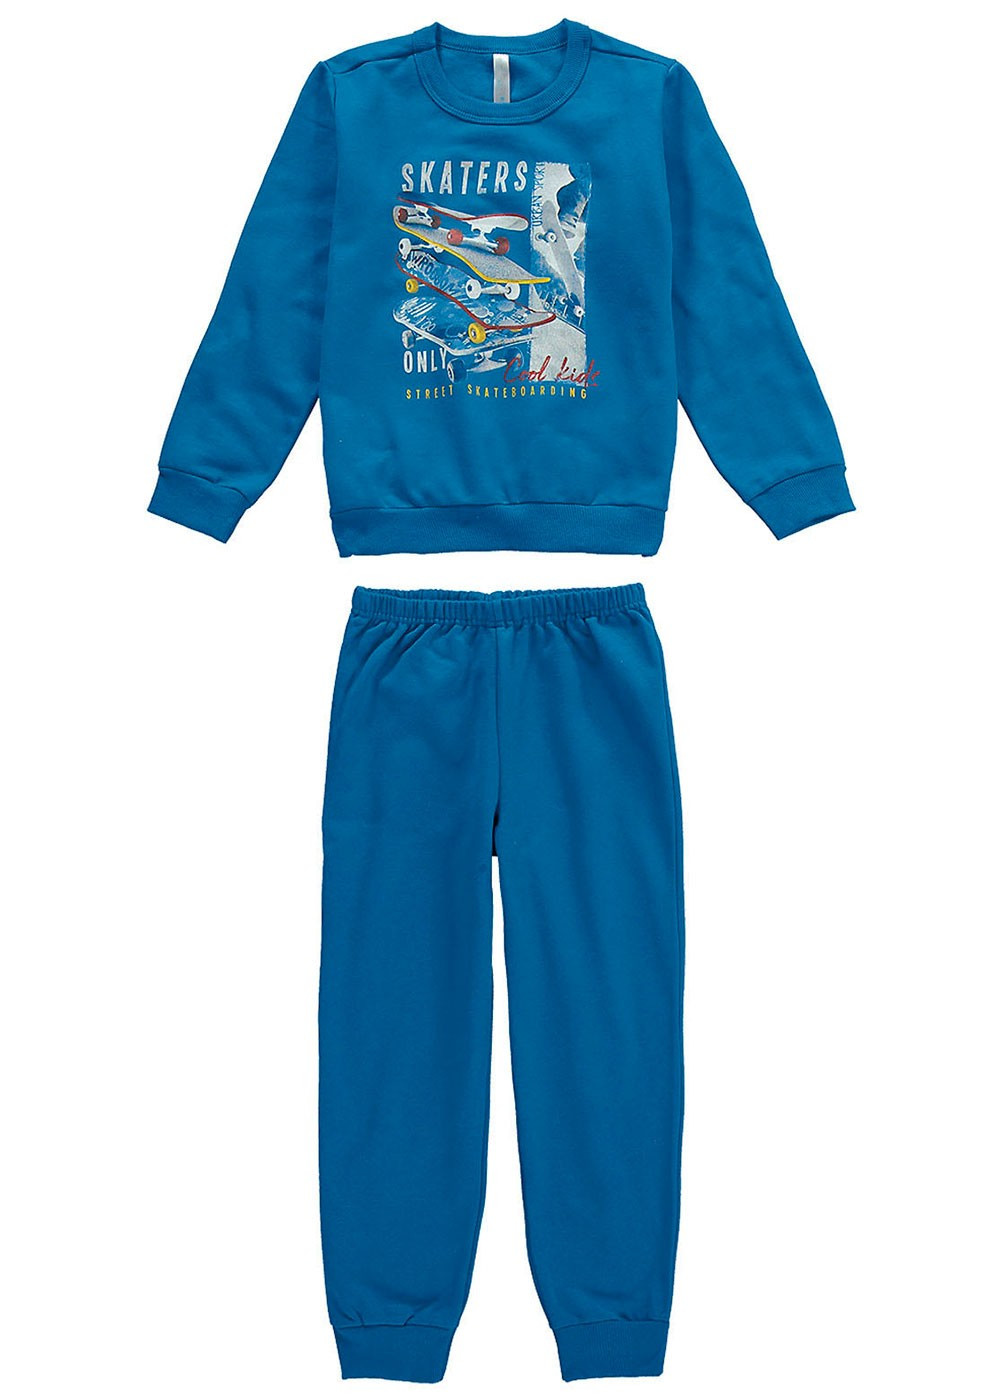 Pijama Infantil Masculino Inverno Azul Skaters Malwee